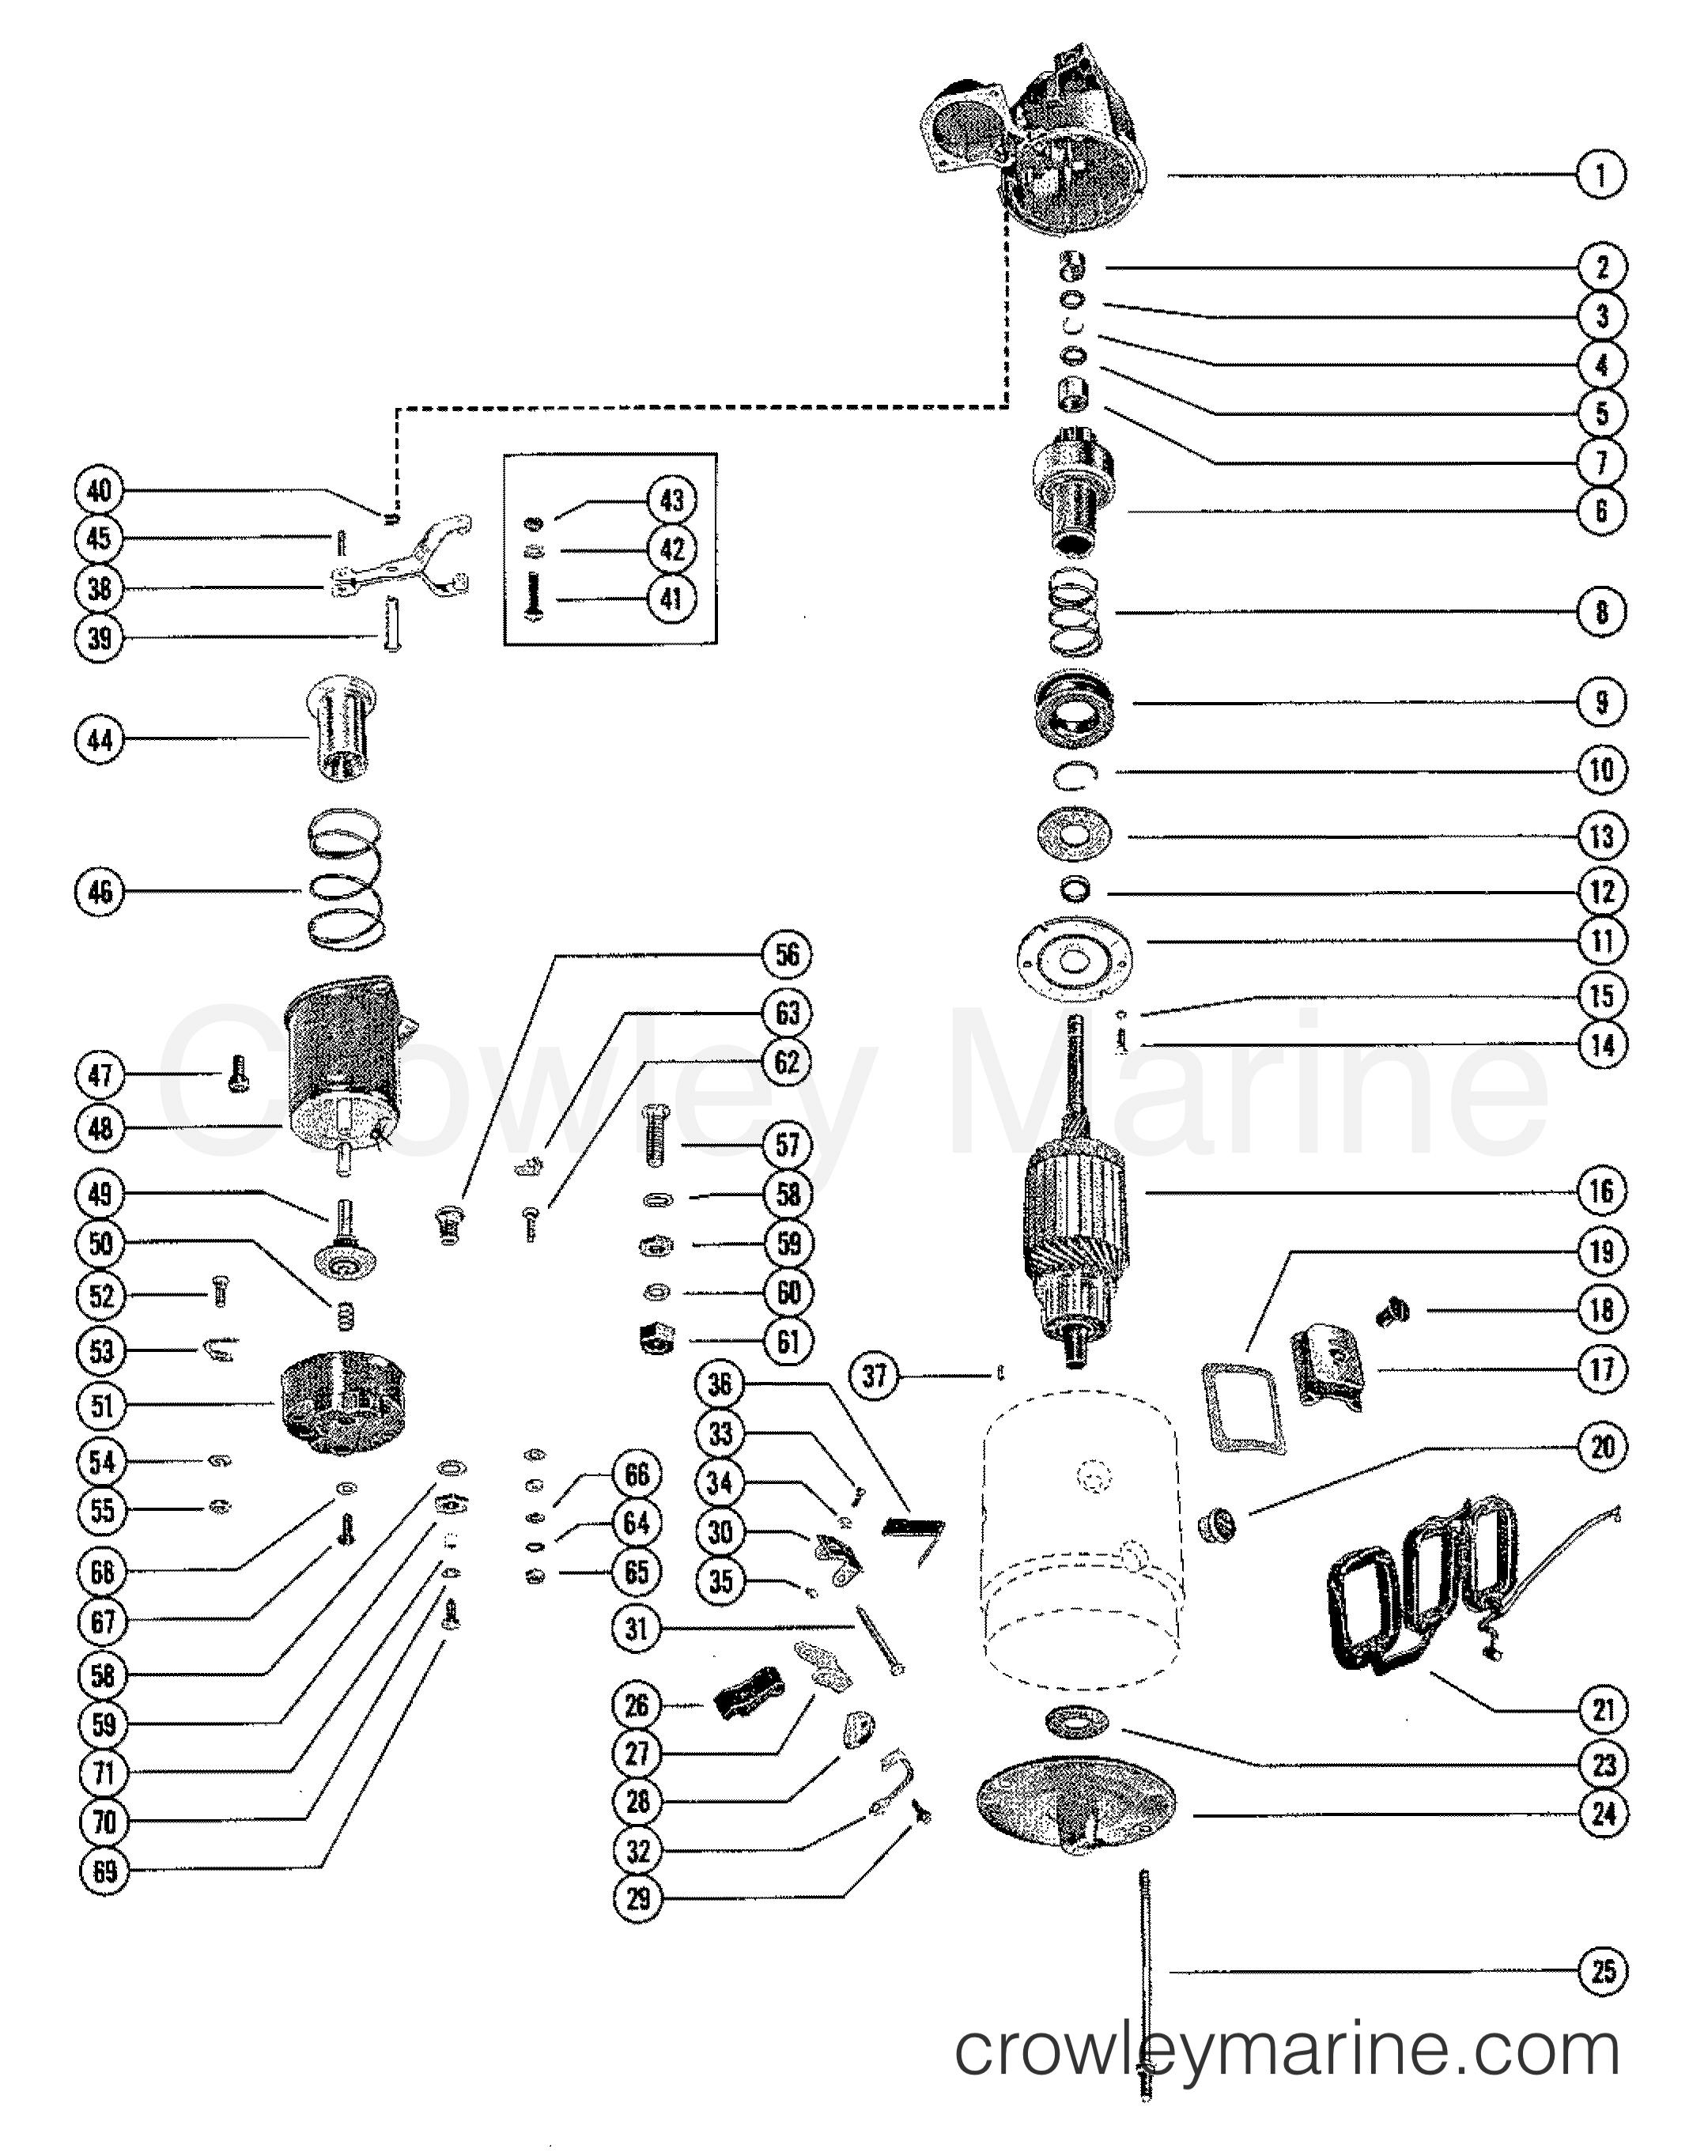 starter motor assembly  complete  b-50-77328a1